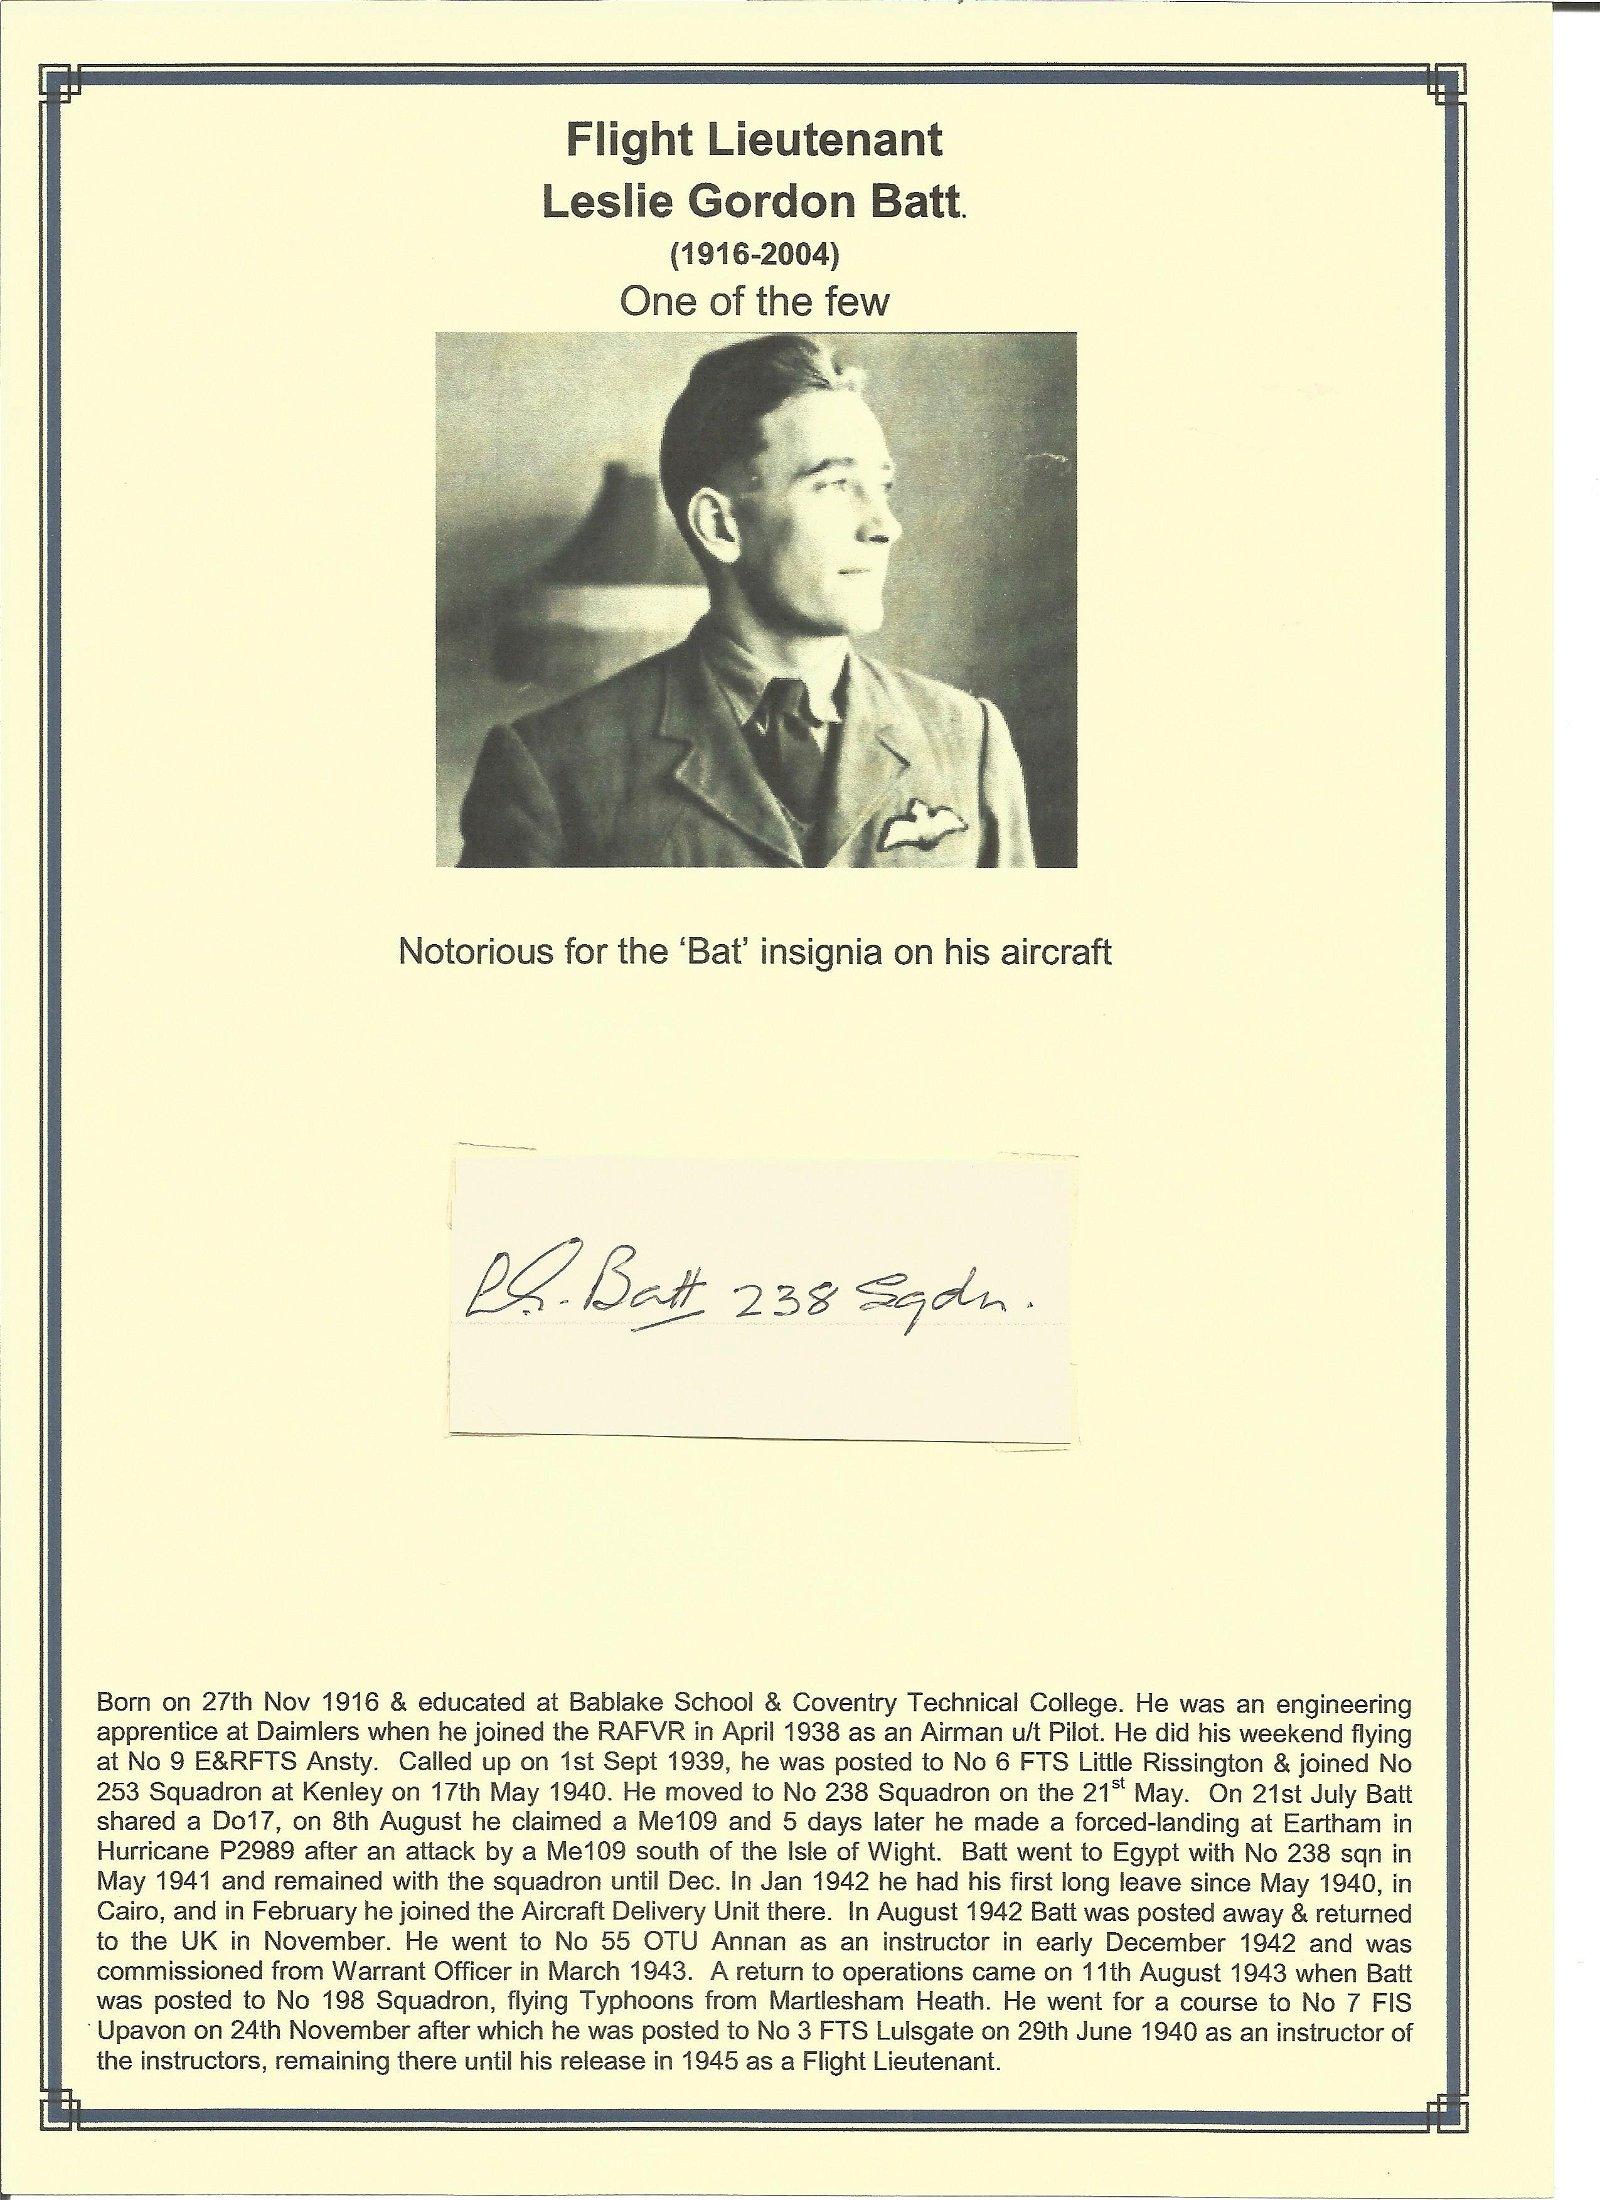 Flight Lieutenant Leslie Gordon Batt Ae signature